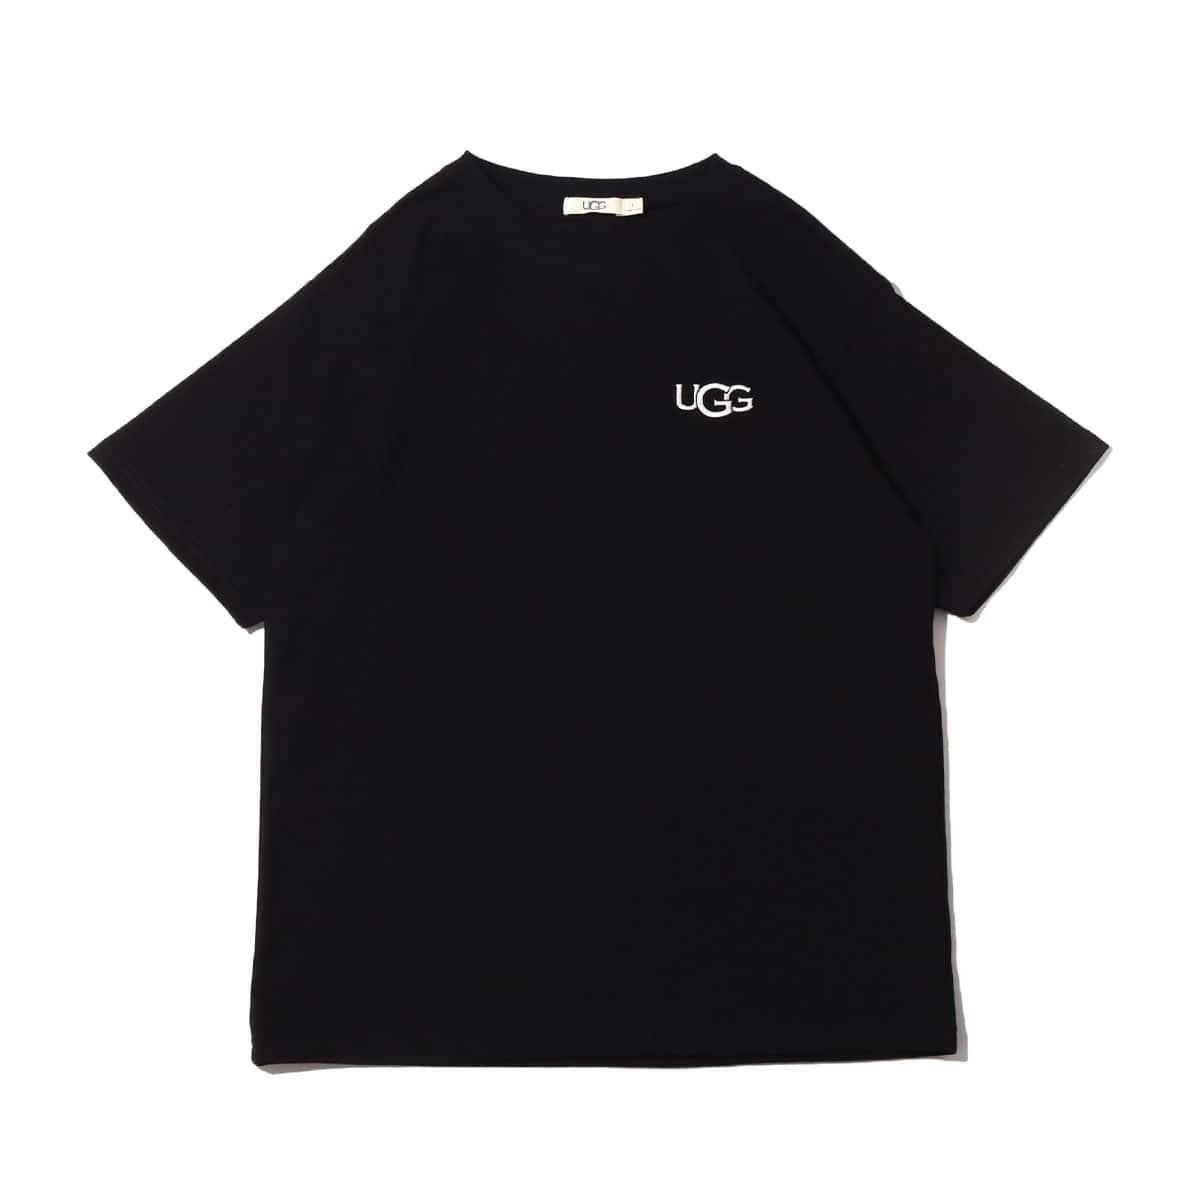 UGG ロゴ刺繍 Tシャツ BLACK 21SS-I_photo_large